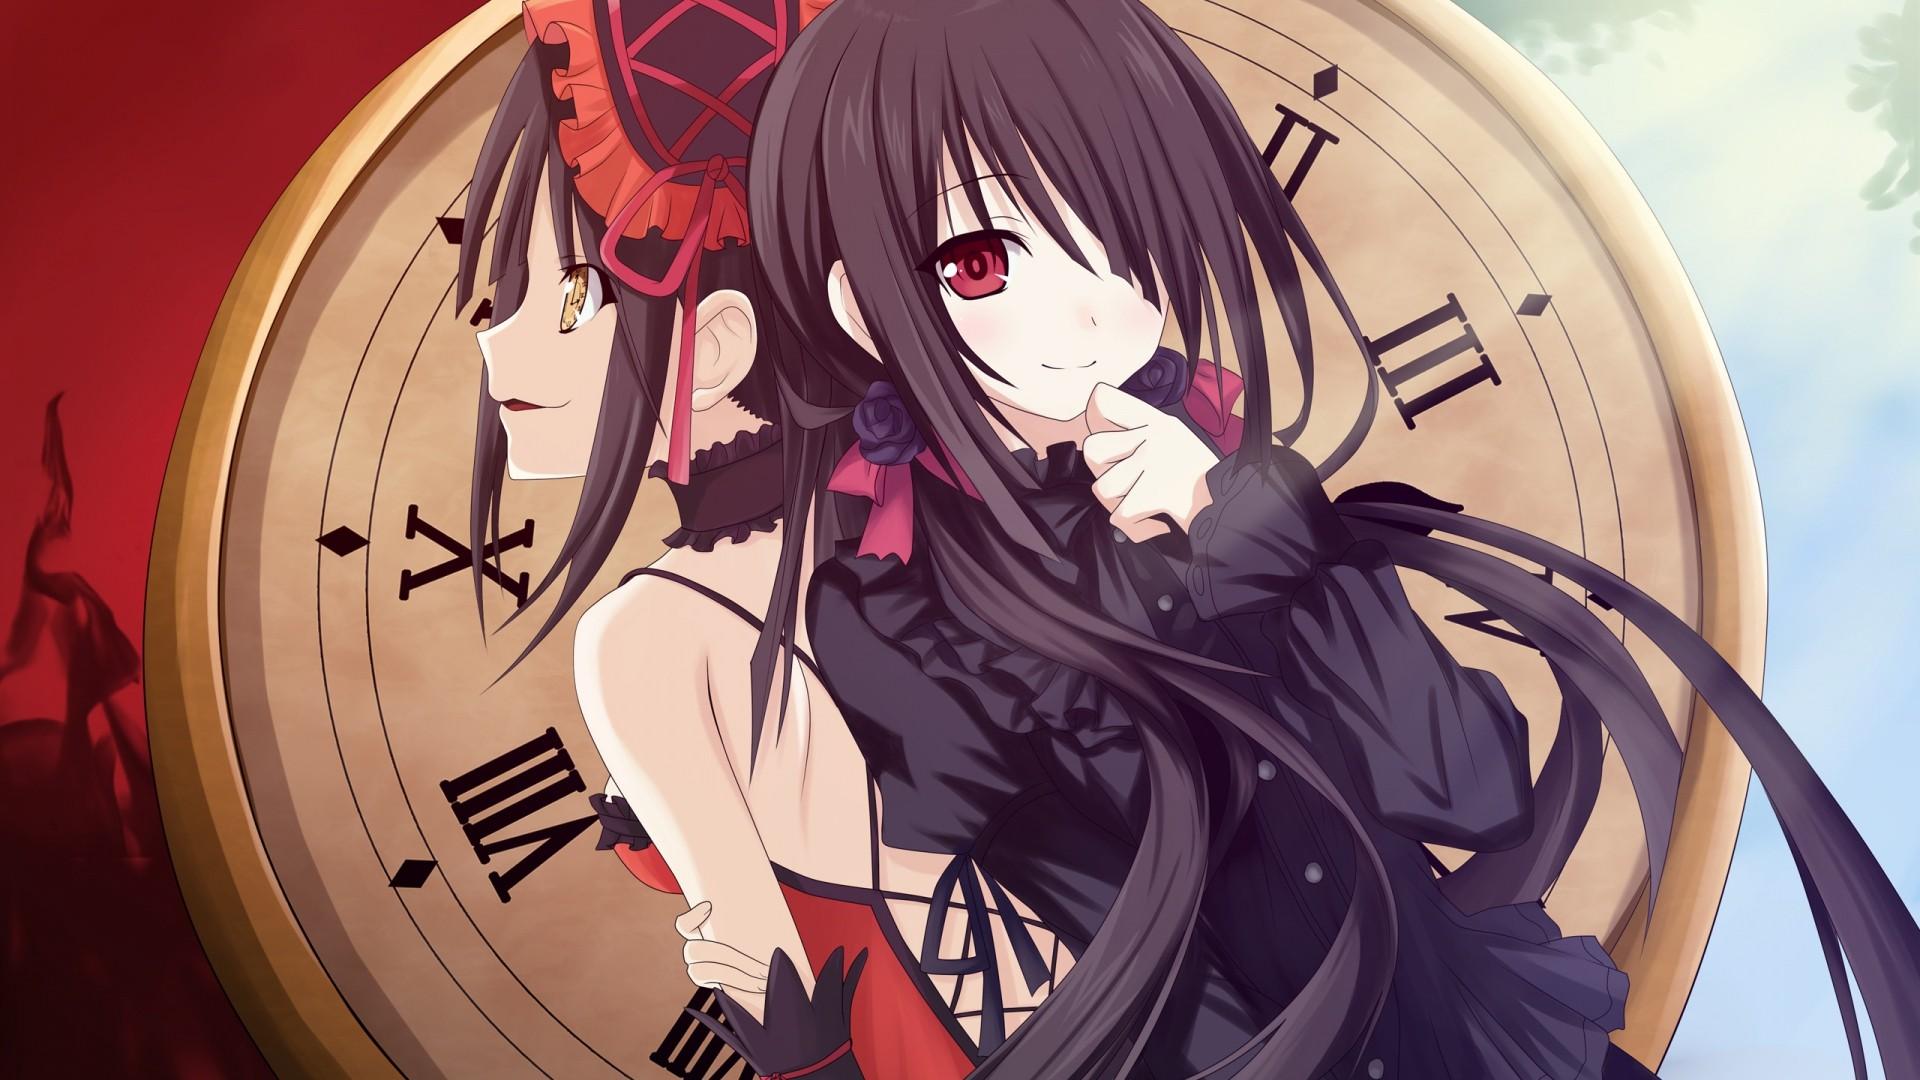 Anime dating advice — 10